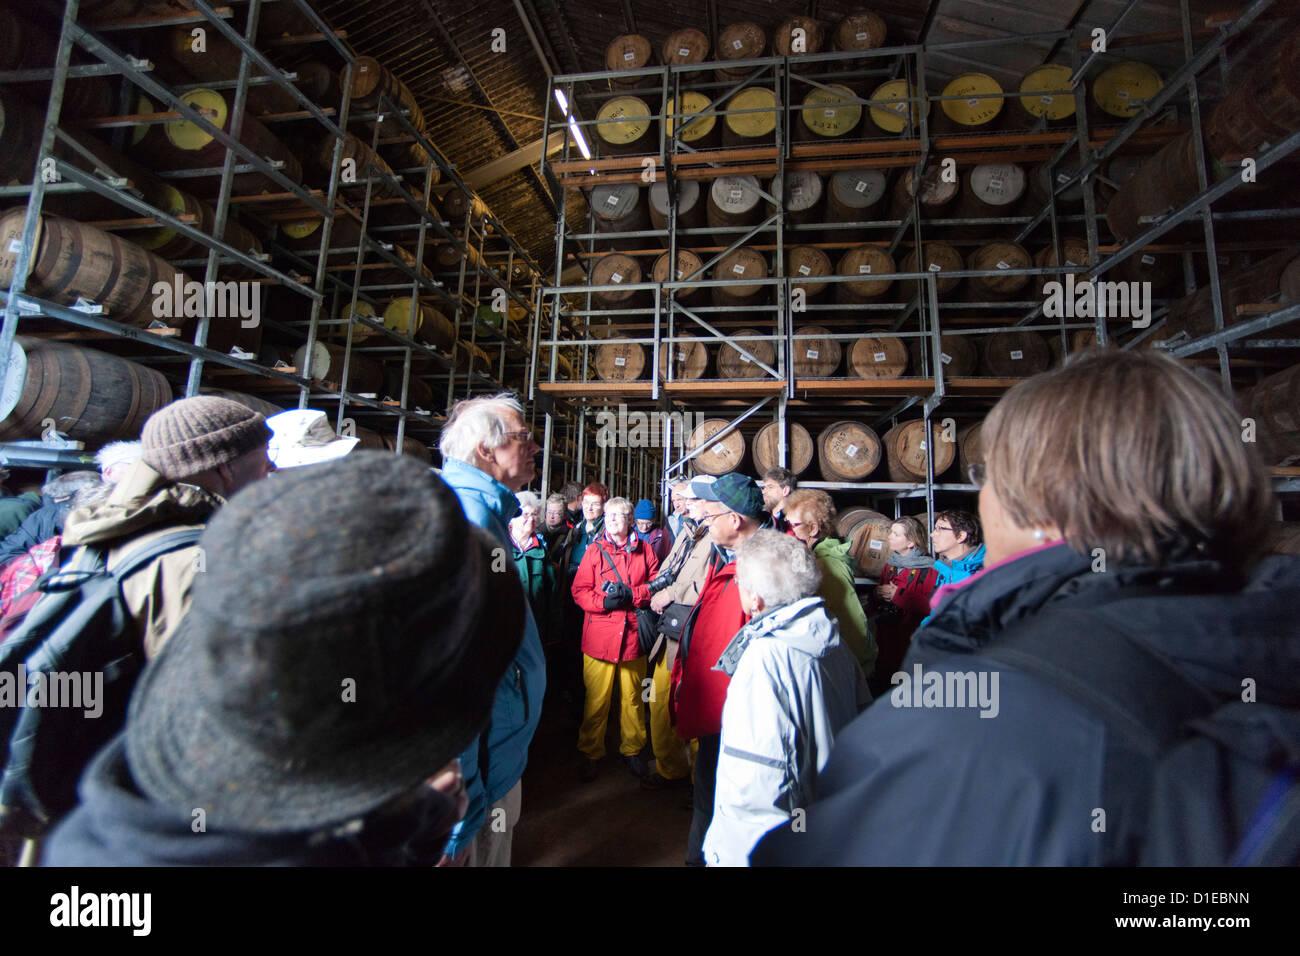 Jura whisky distillery barrel storage, Jura Island, Inner Hebrides, Scotland, United Kingdom, Europe - Stock Image